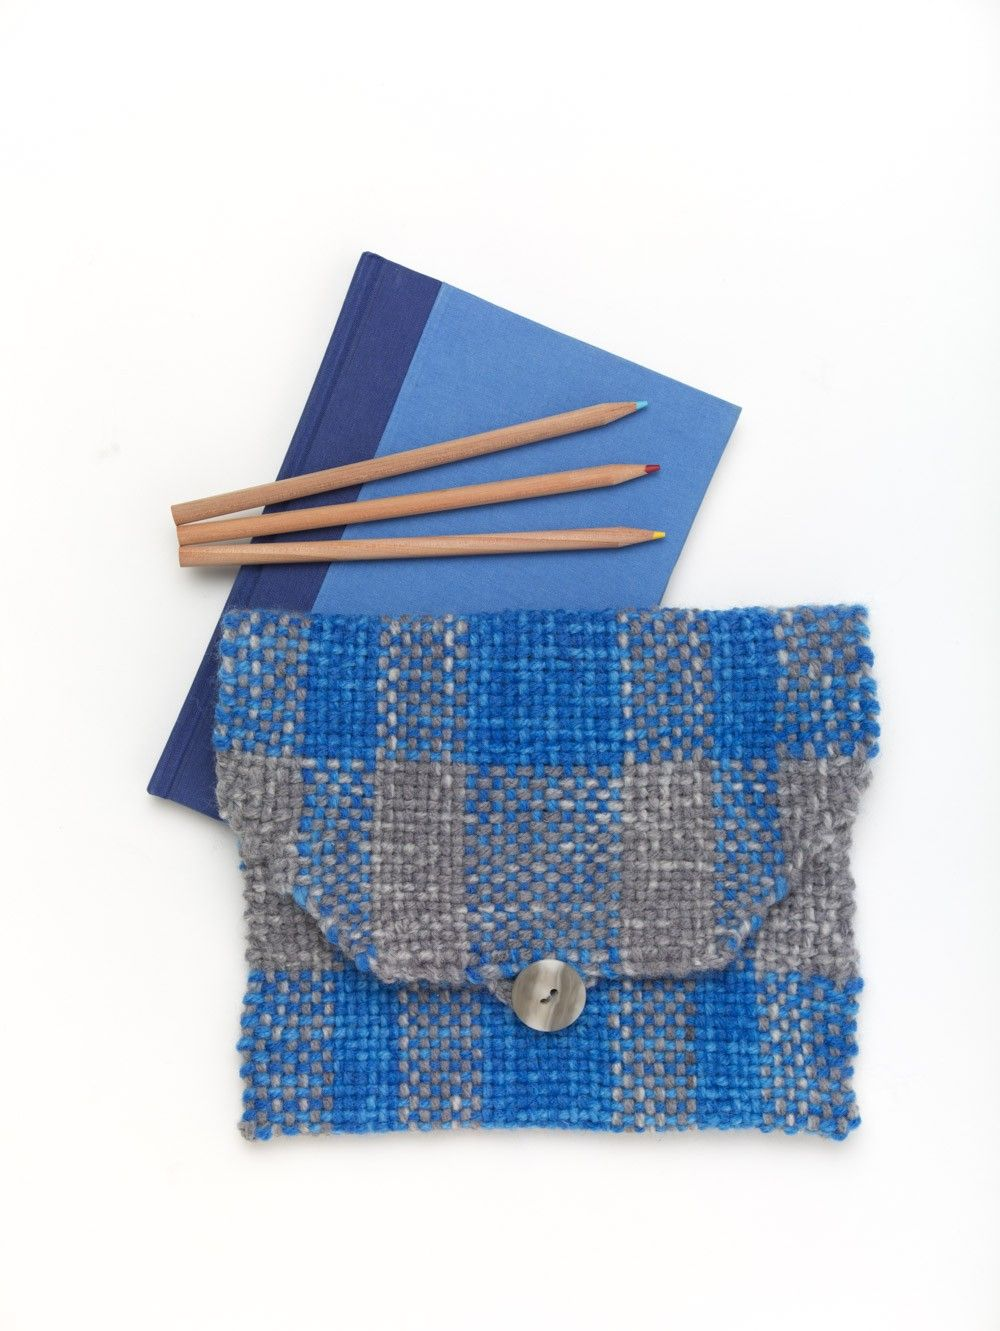 Woven Clutch Bag (Loom/Weave) | Crafty stuff | Pinterest